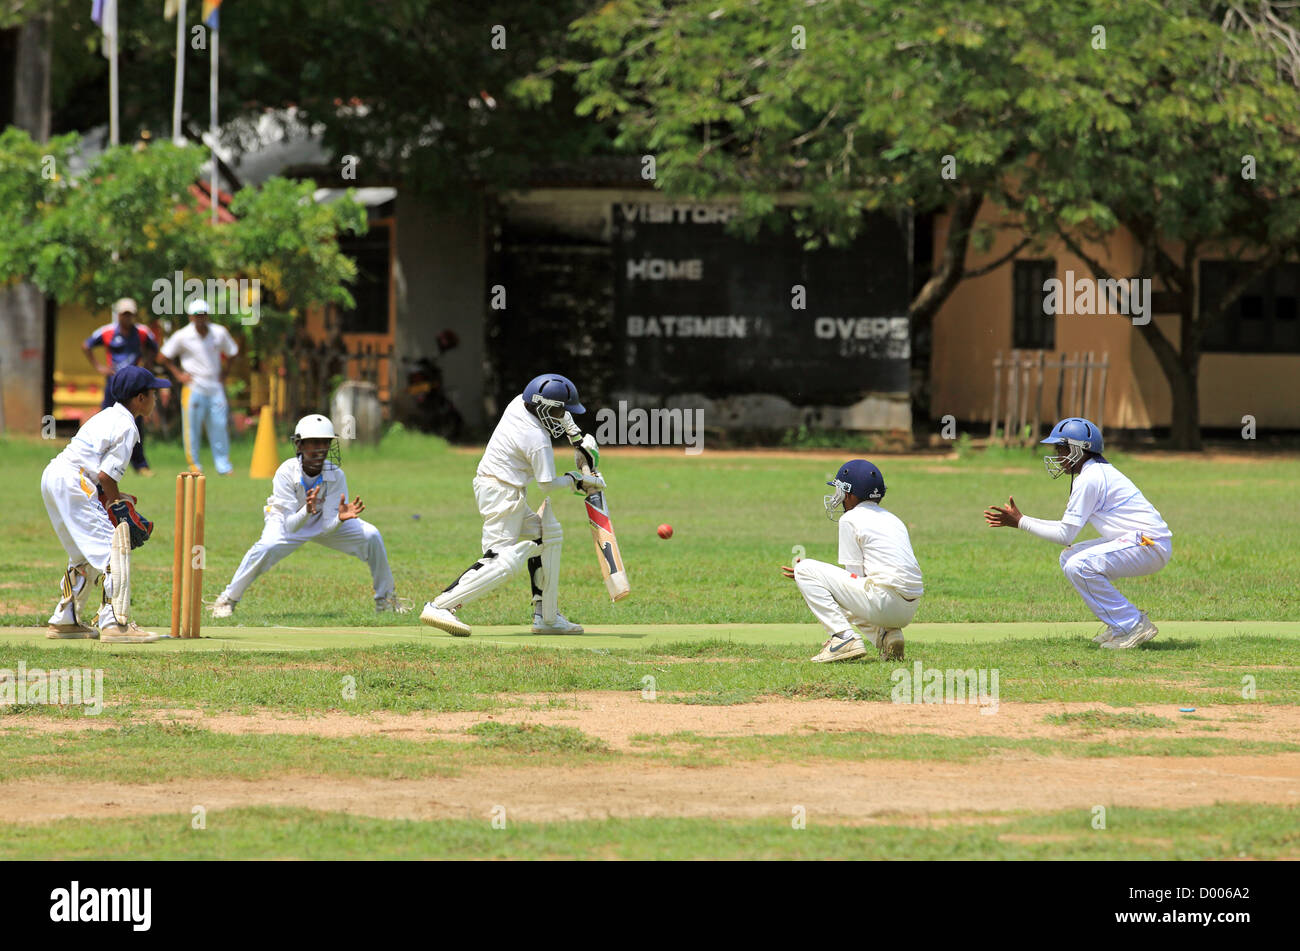 Schoolboys playing inter school cricket match in Tissamaharama, Sri Lanka. - Stock Image